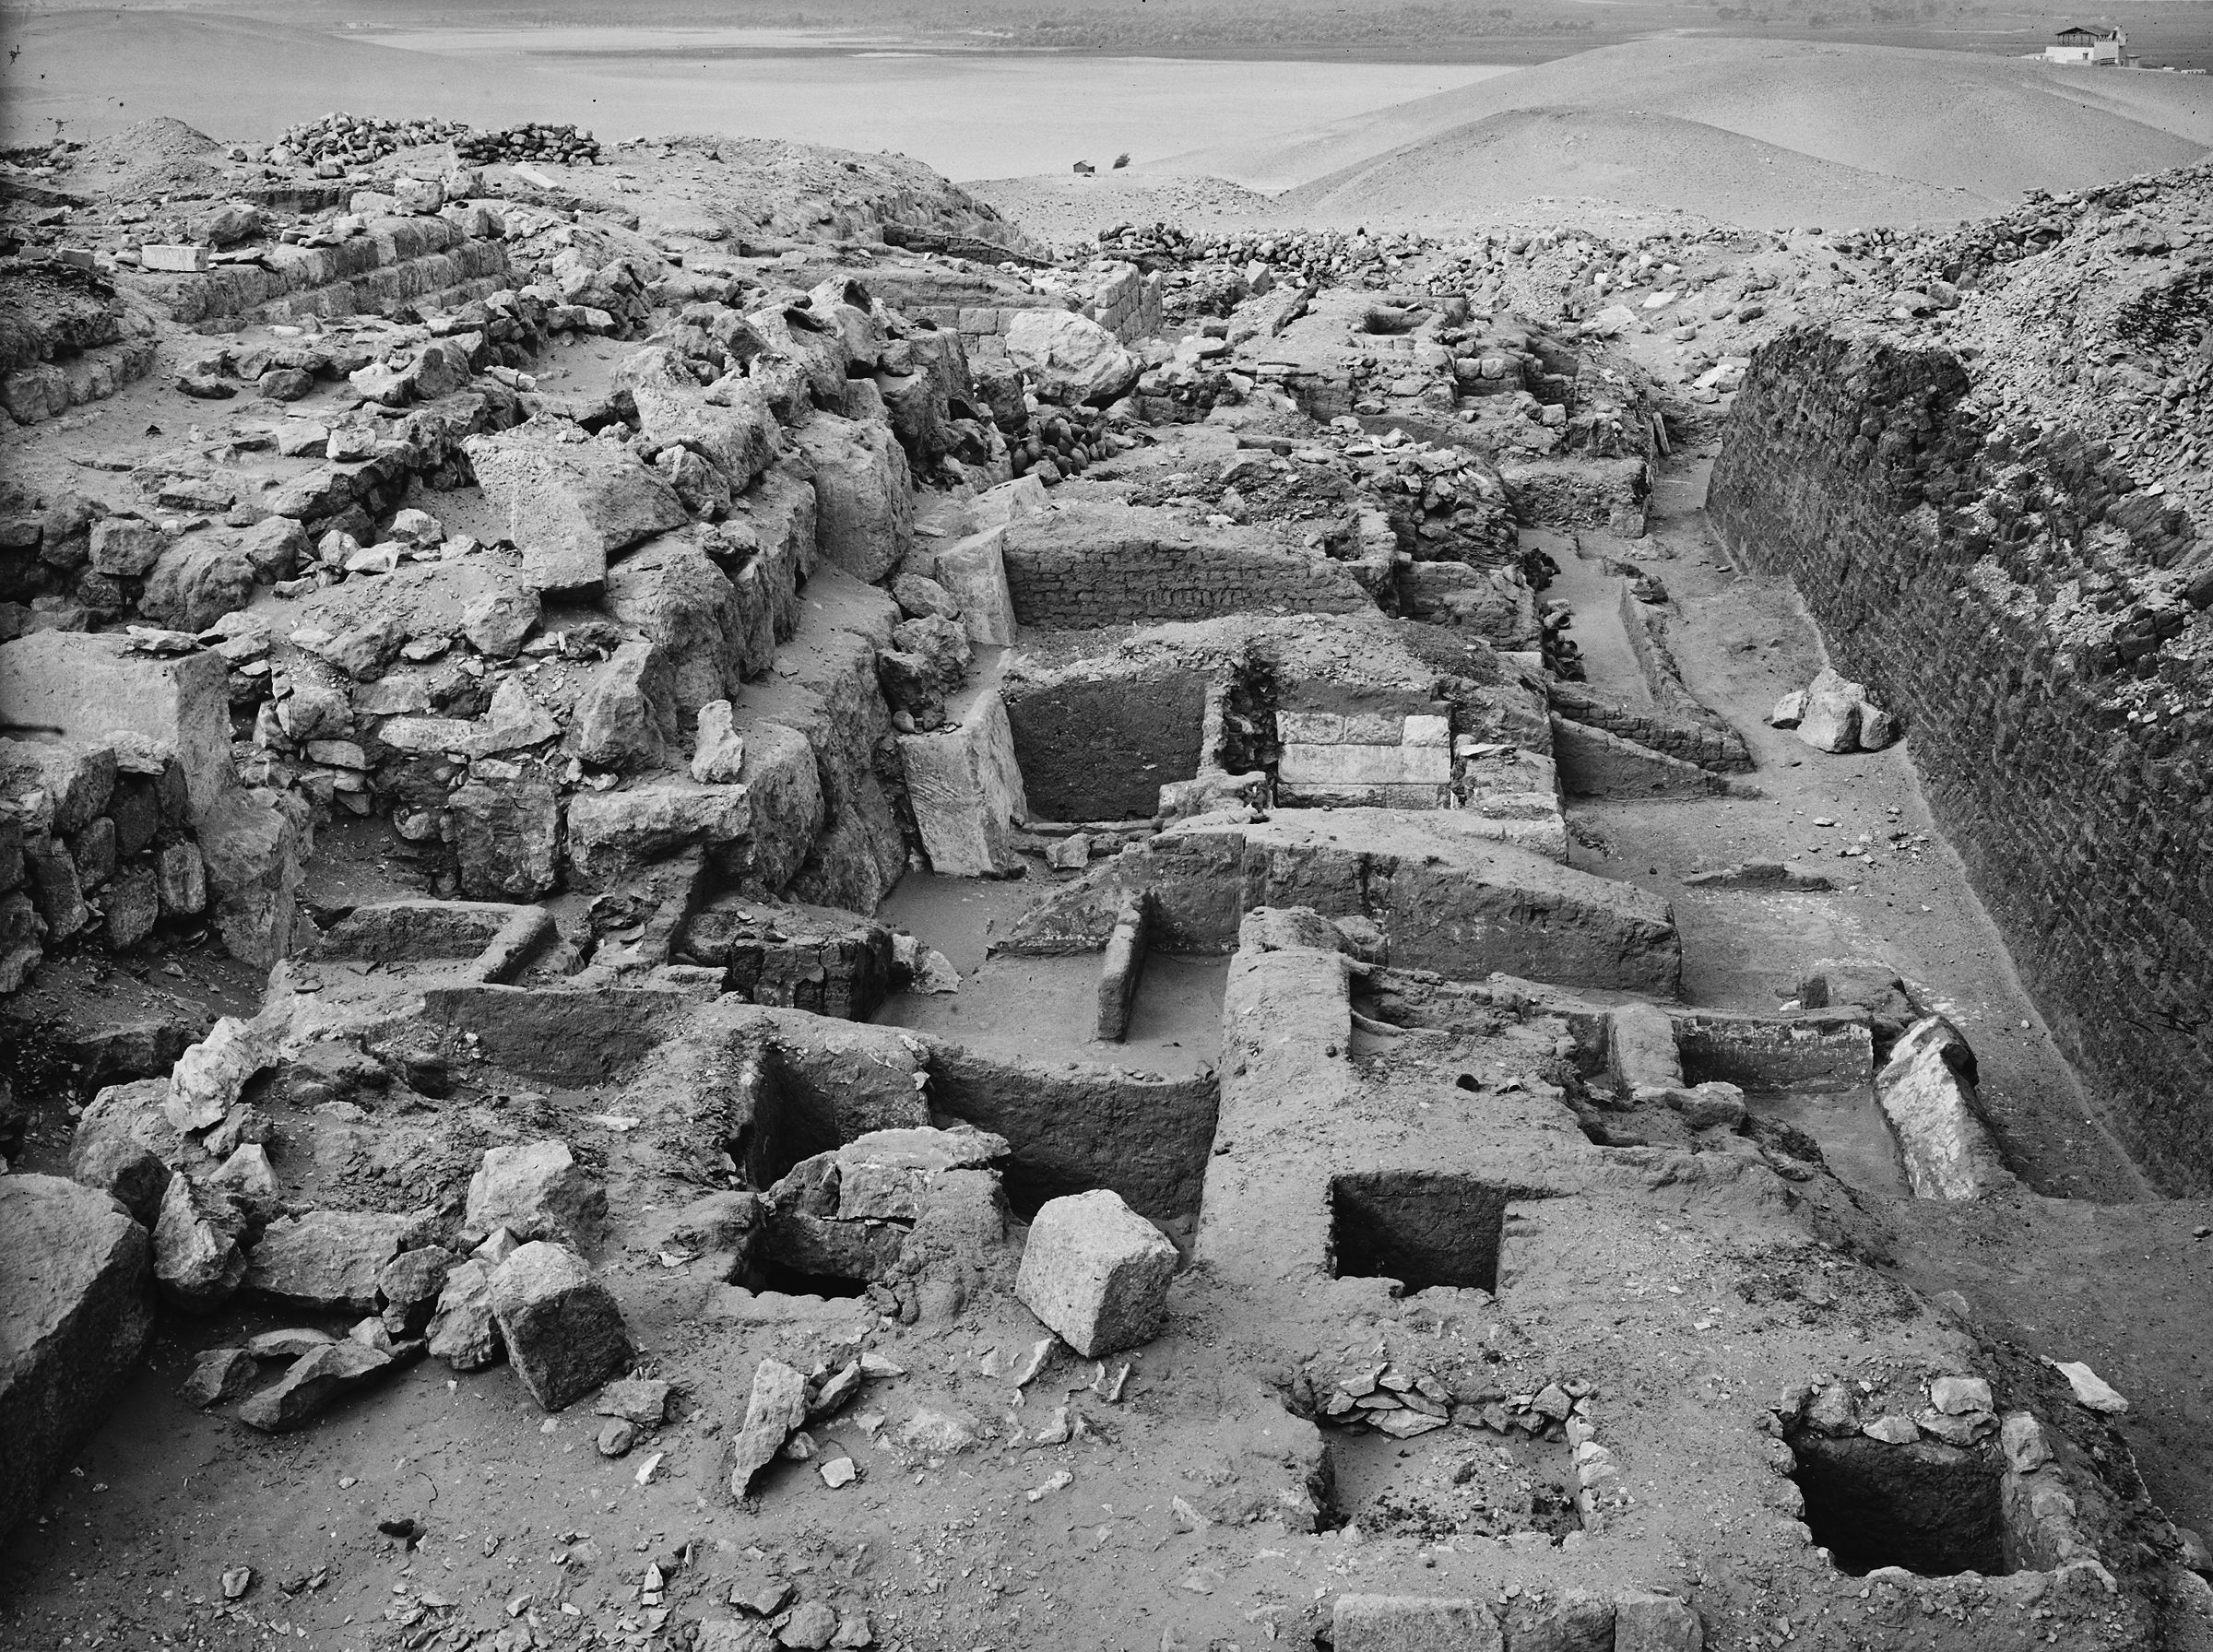 Western Cemetery: Site: Giza; View: G 1223, G 1221, G 1224+1311, G 1310, G 1309, G 1308